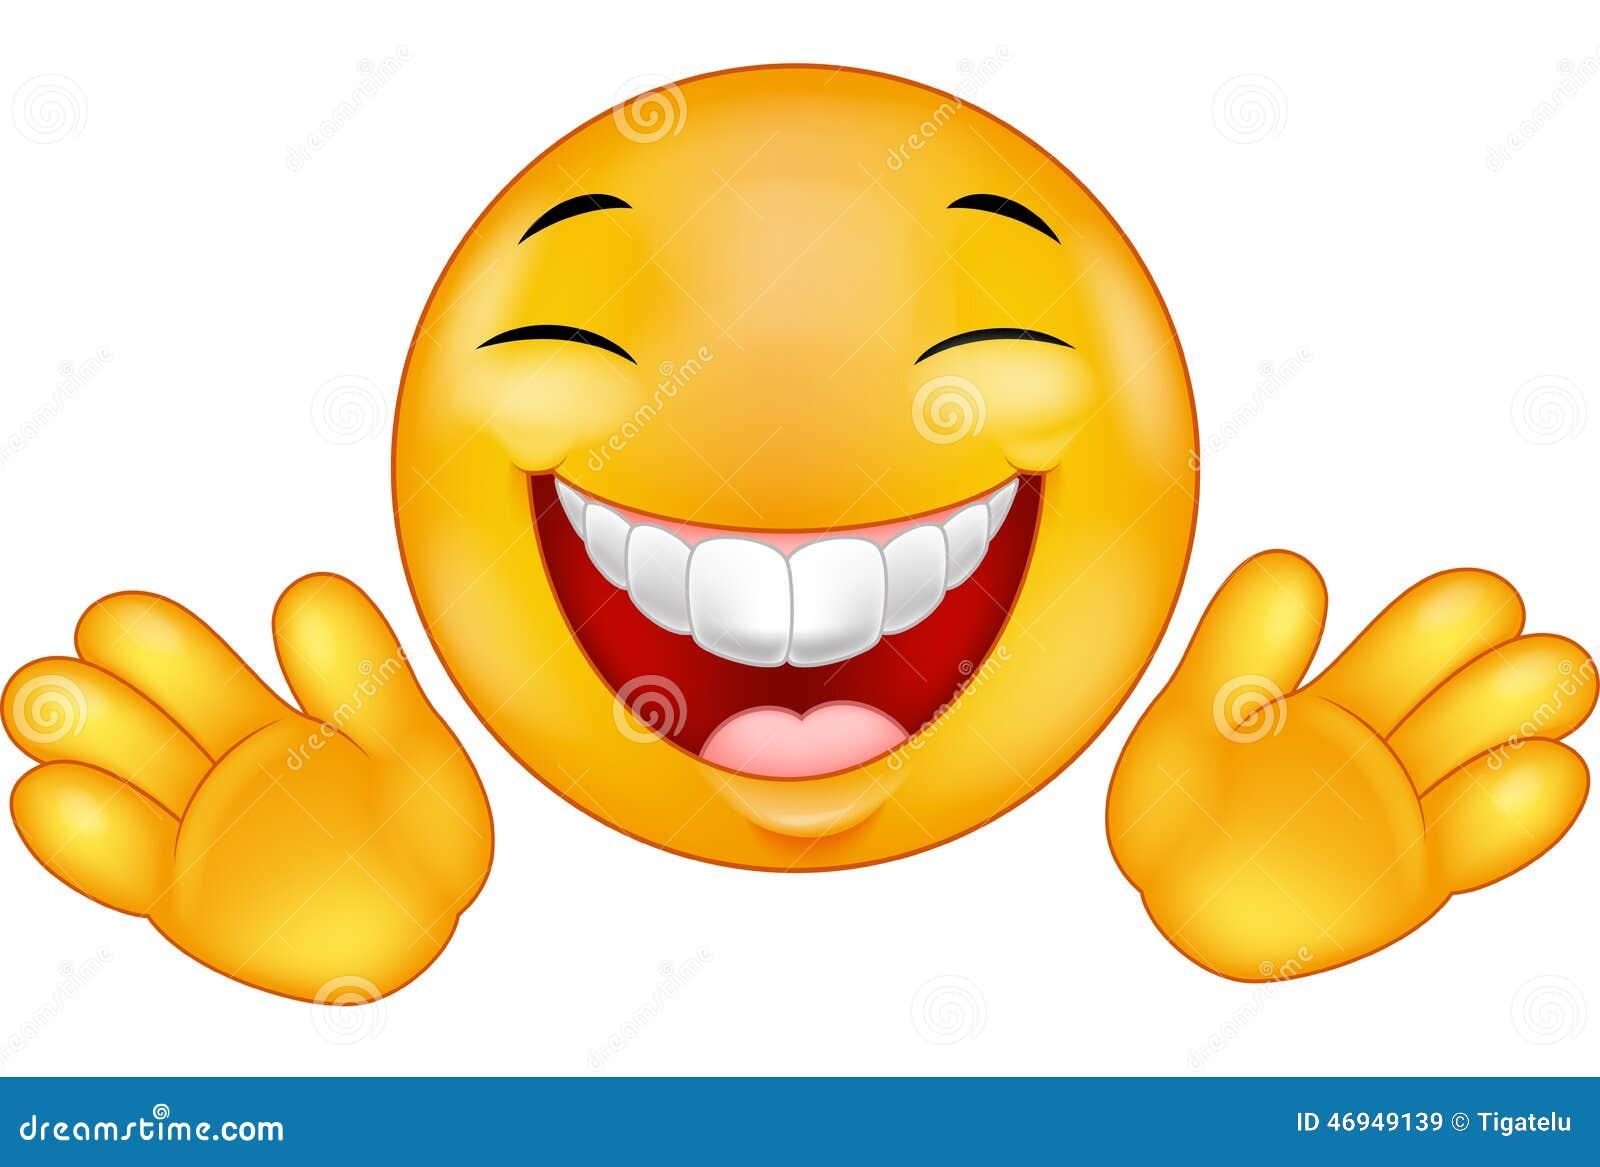 Hug Emoticon Stock Vector Illustration Of Character 42424031